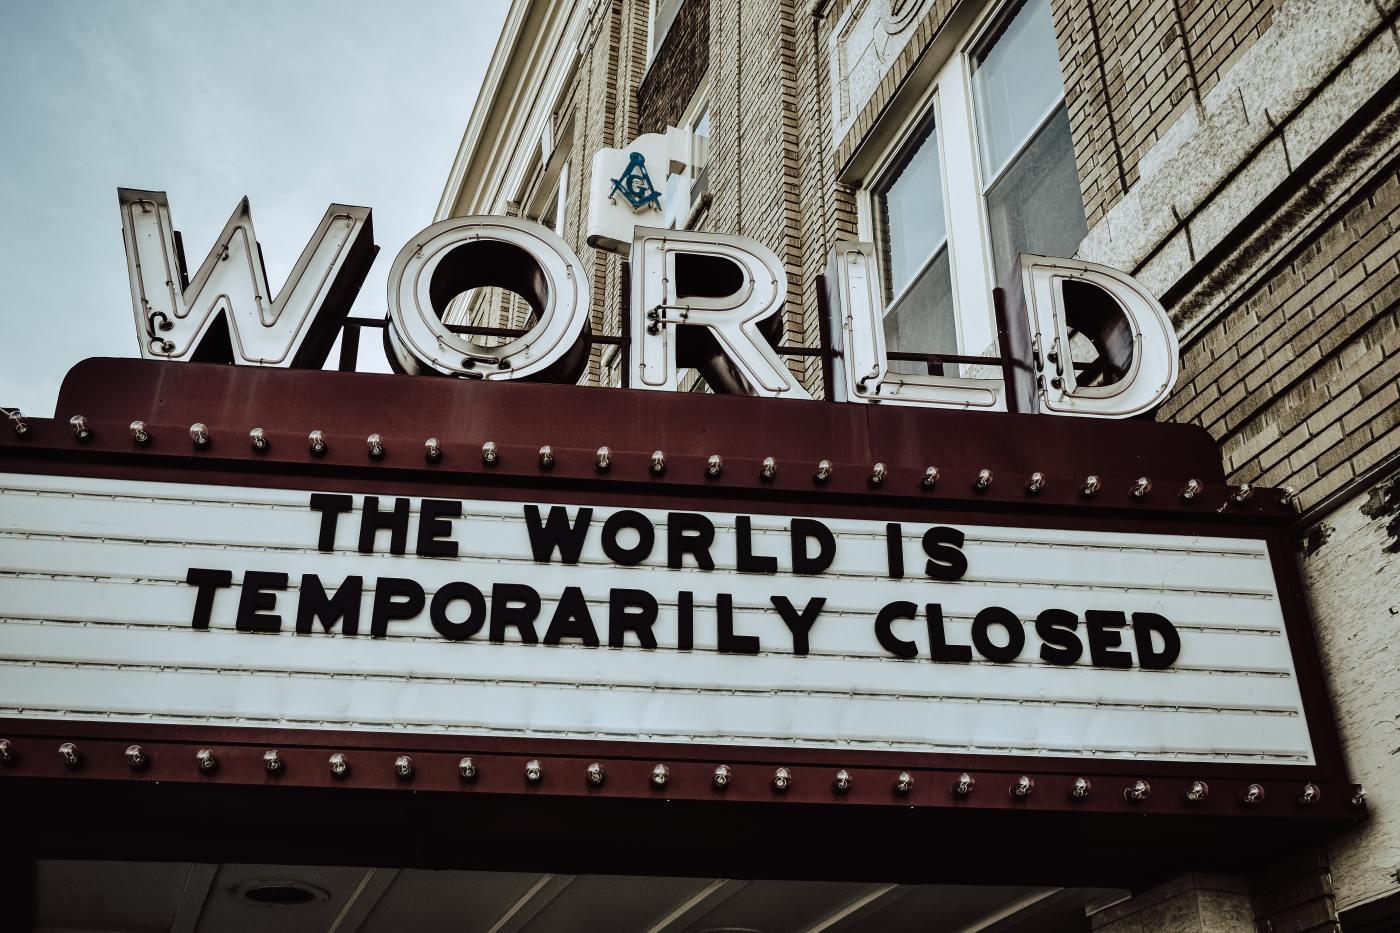 Cinema Marquee by Edwin Hooper via Unsplash